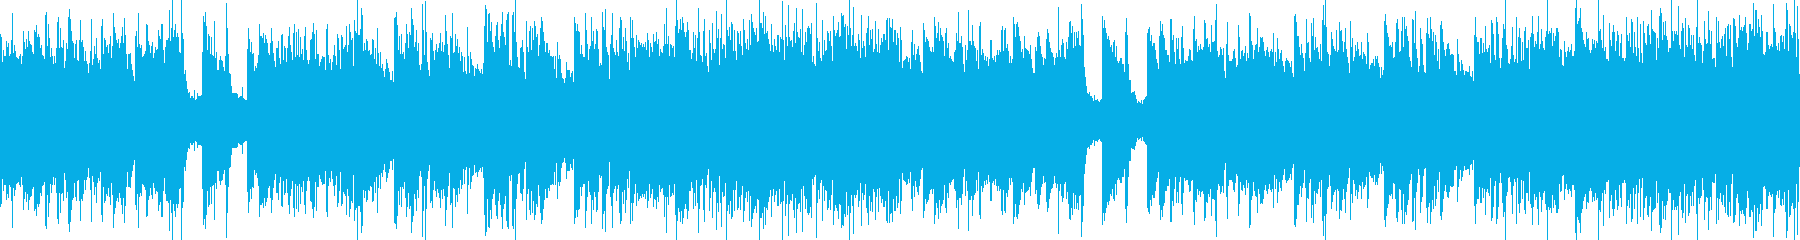 RPGの戦闘曲をイメージして作りました…の再生済みの波形